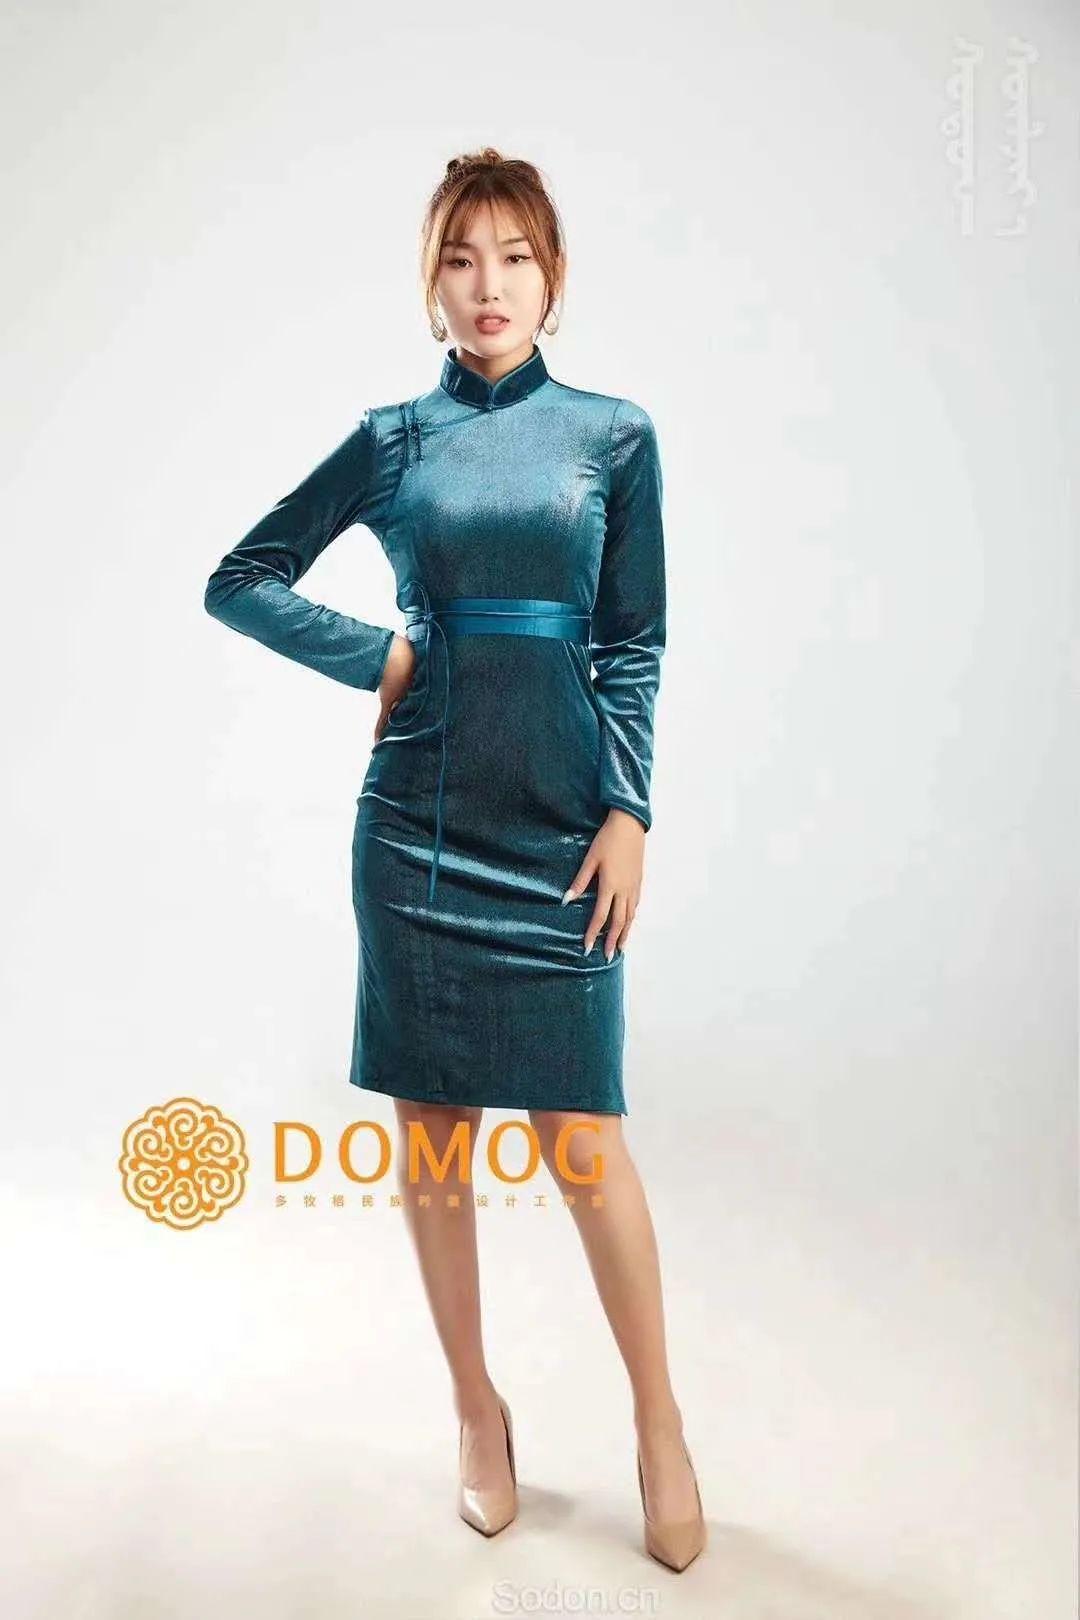 DOMOG 蒙古时装2020新款,民族与时尚的融合 第49张 DOMOG 蒙古时装2020新款,民族与时尚的融合 蒙古服饰